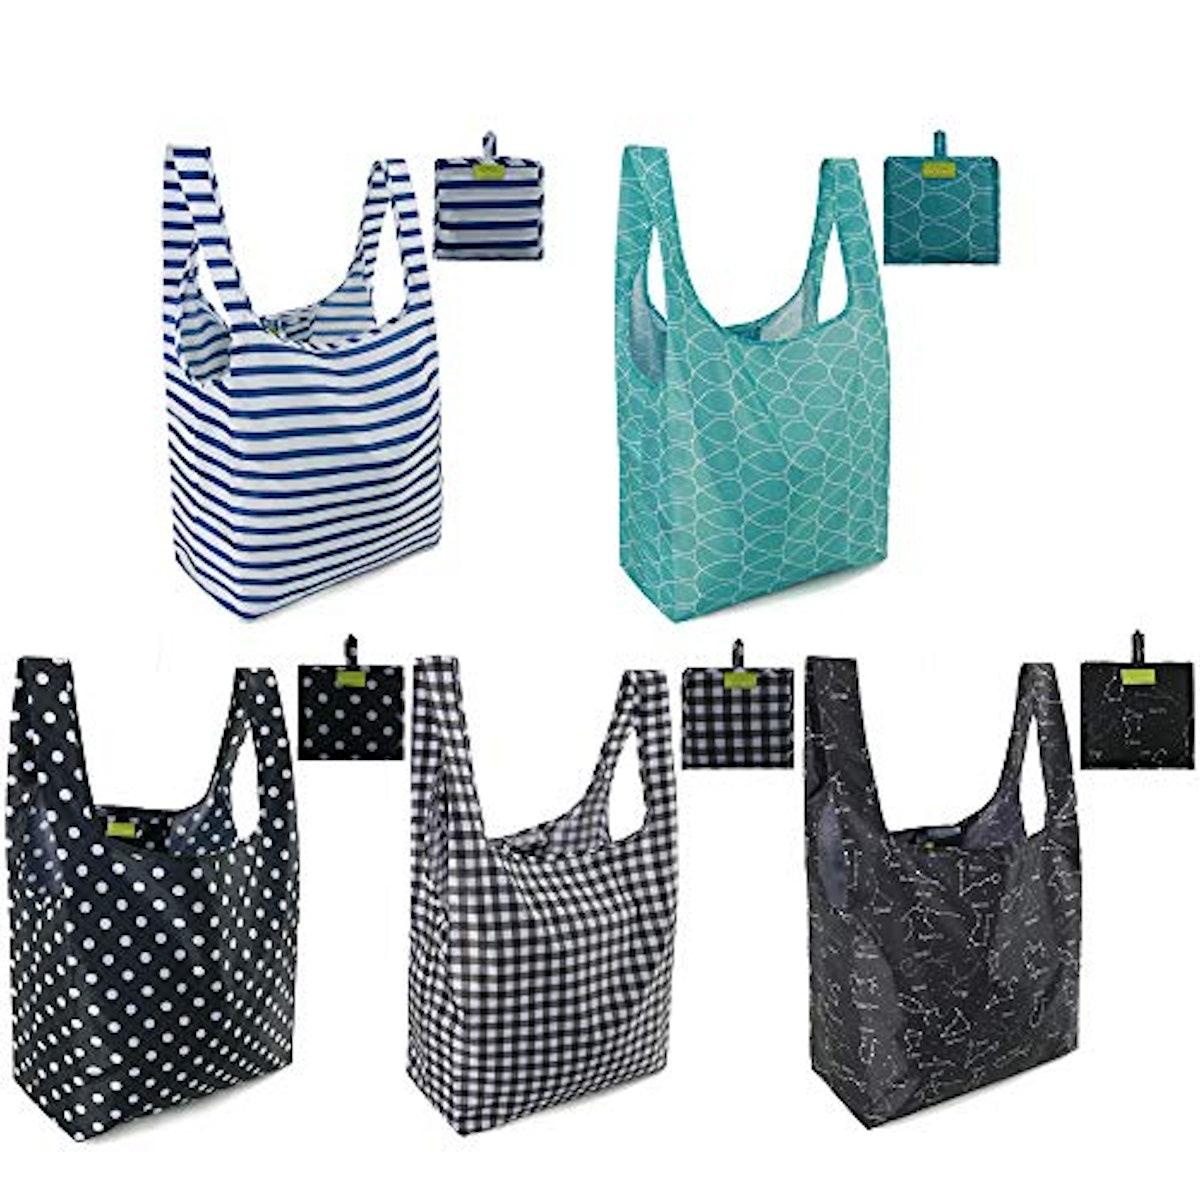 Beegreenbags Reusable Shopping Bags